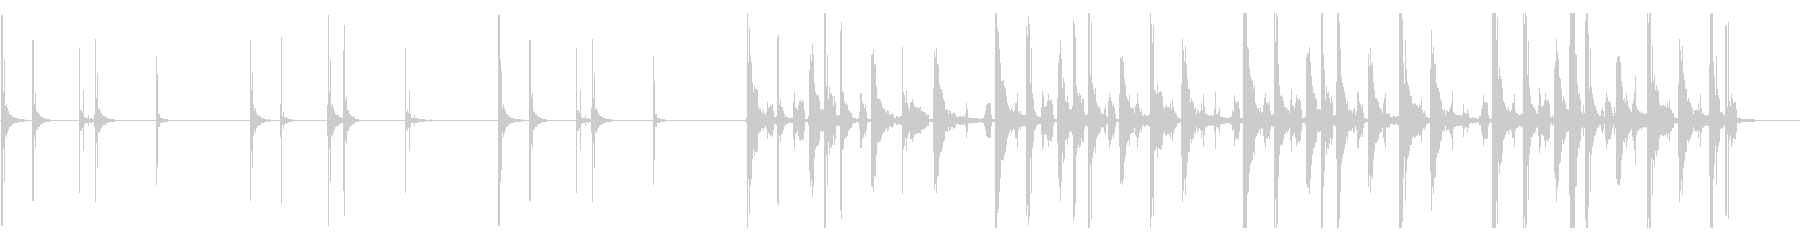 KANTハンズクラップジングル2の未再生の波形